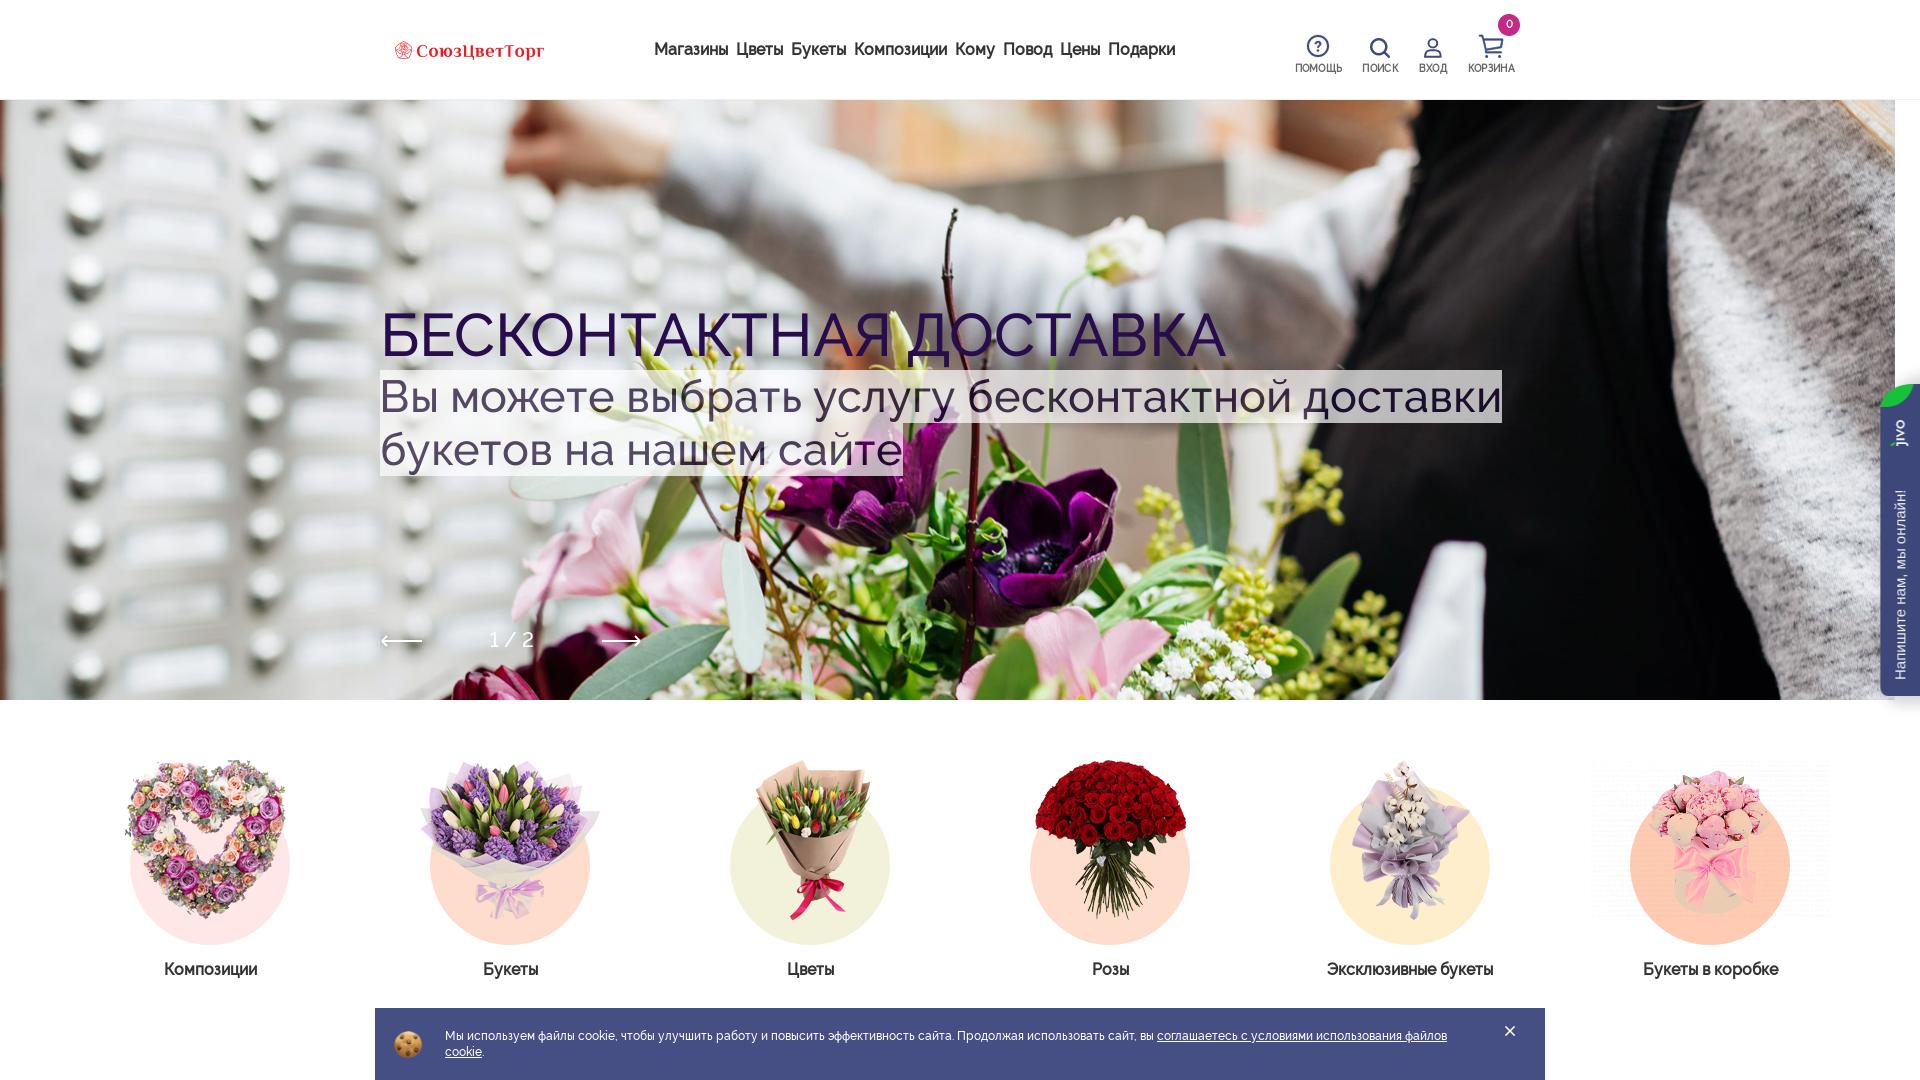 СоюзЦветТорг website